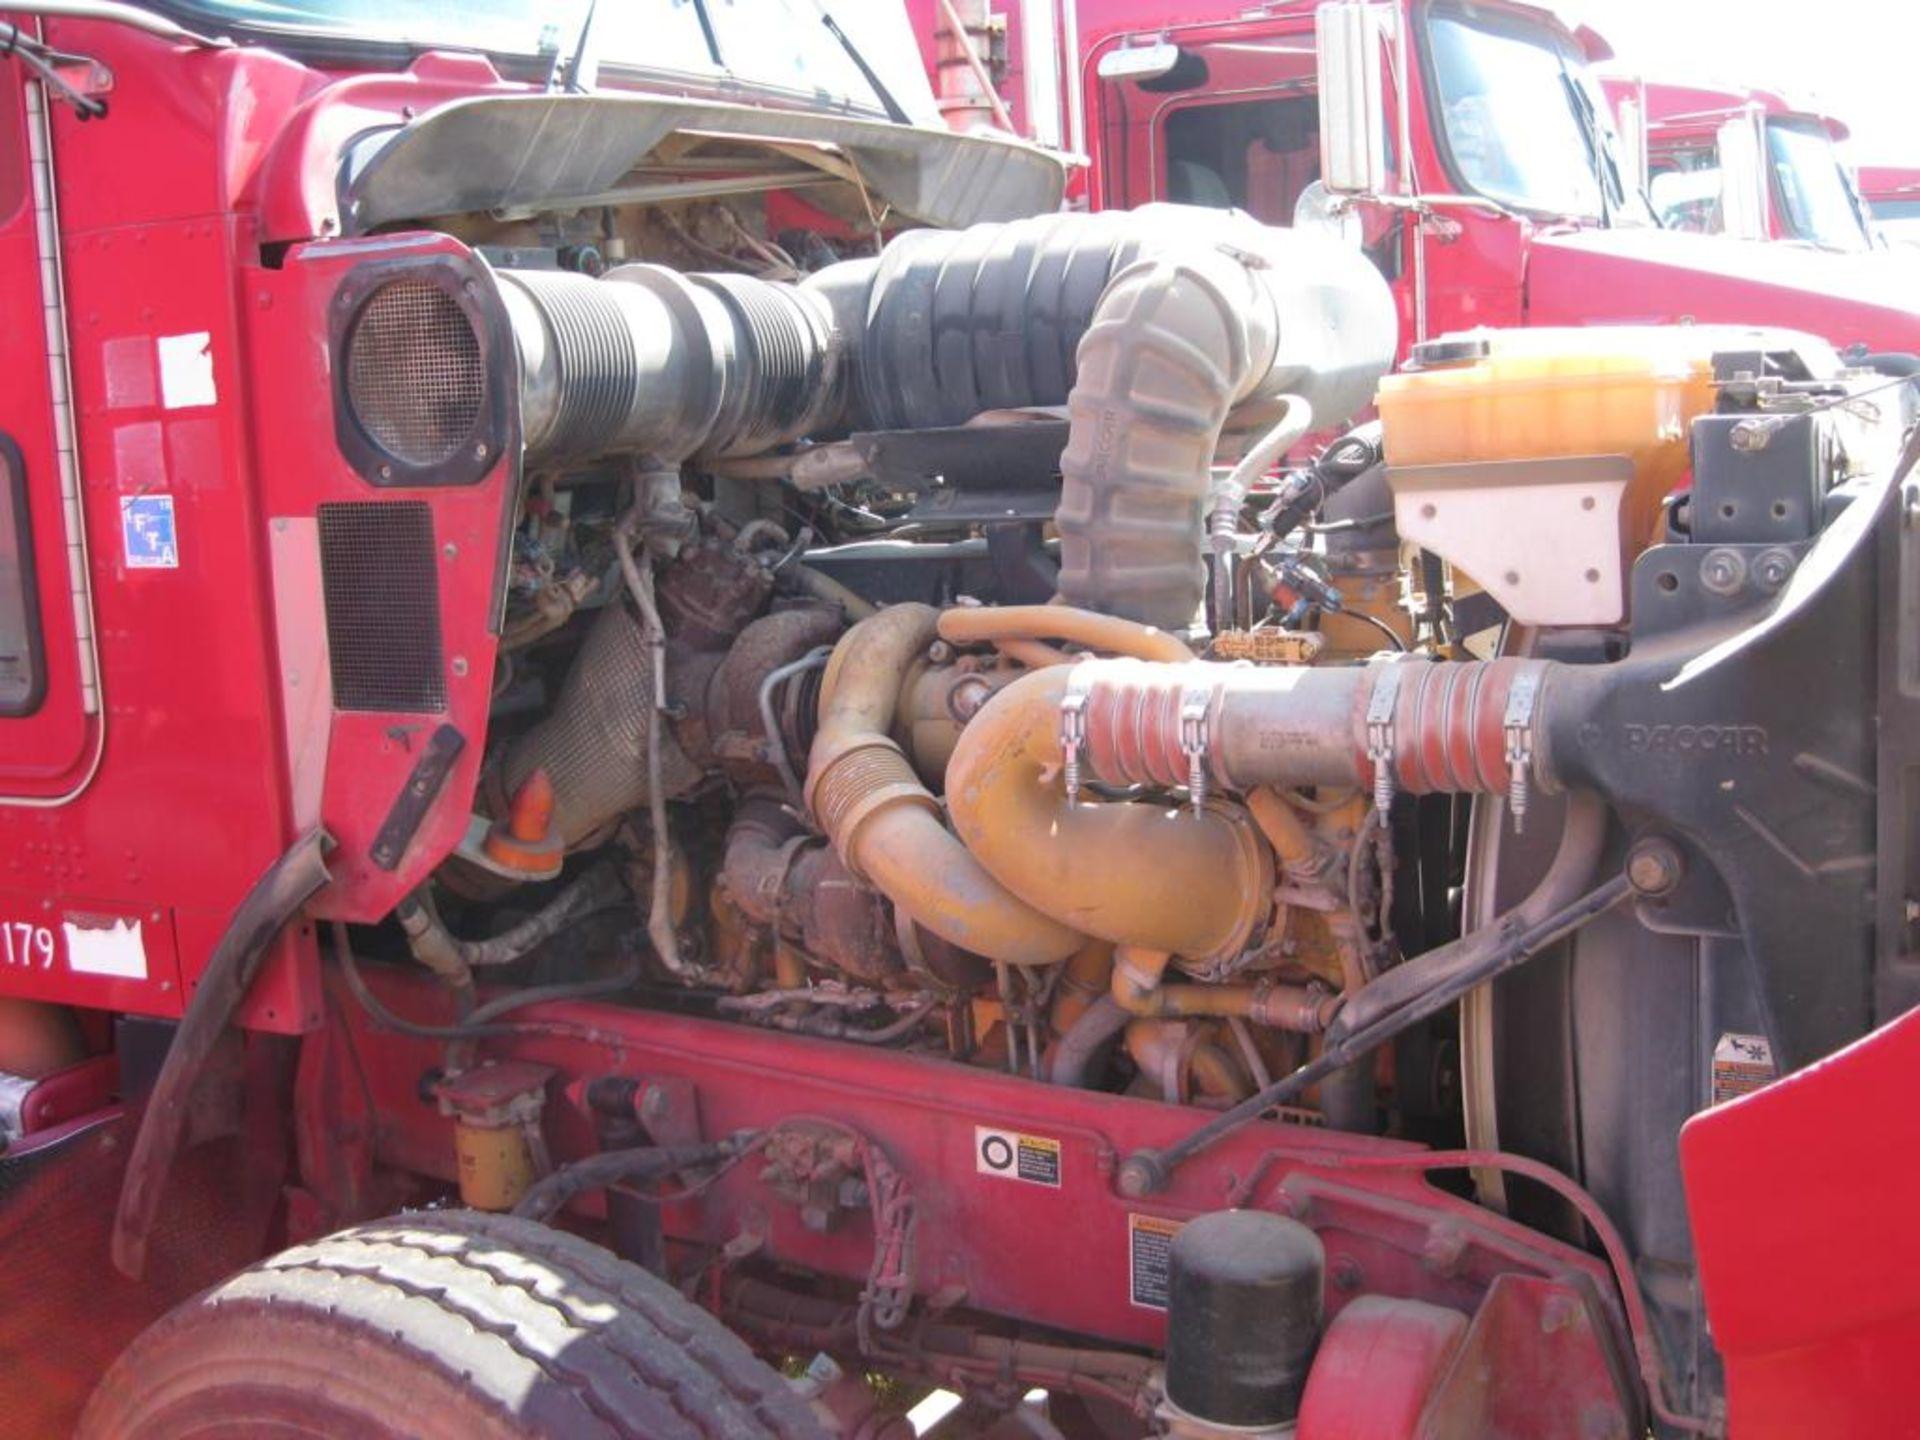 Kenworth Truck - Image 21 of 21